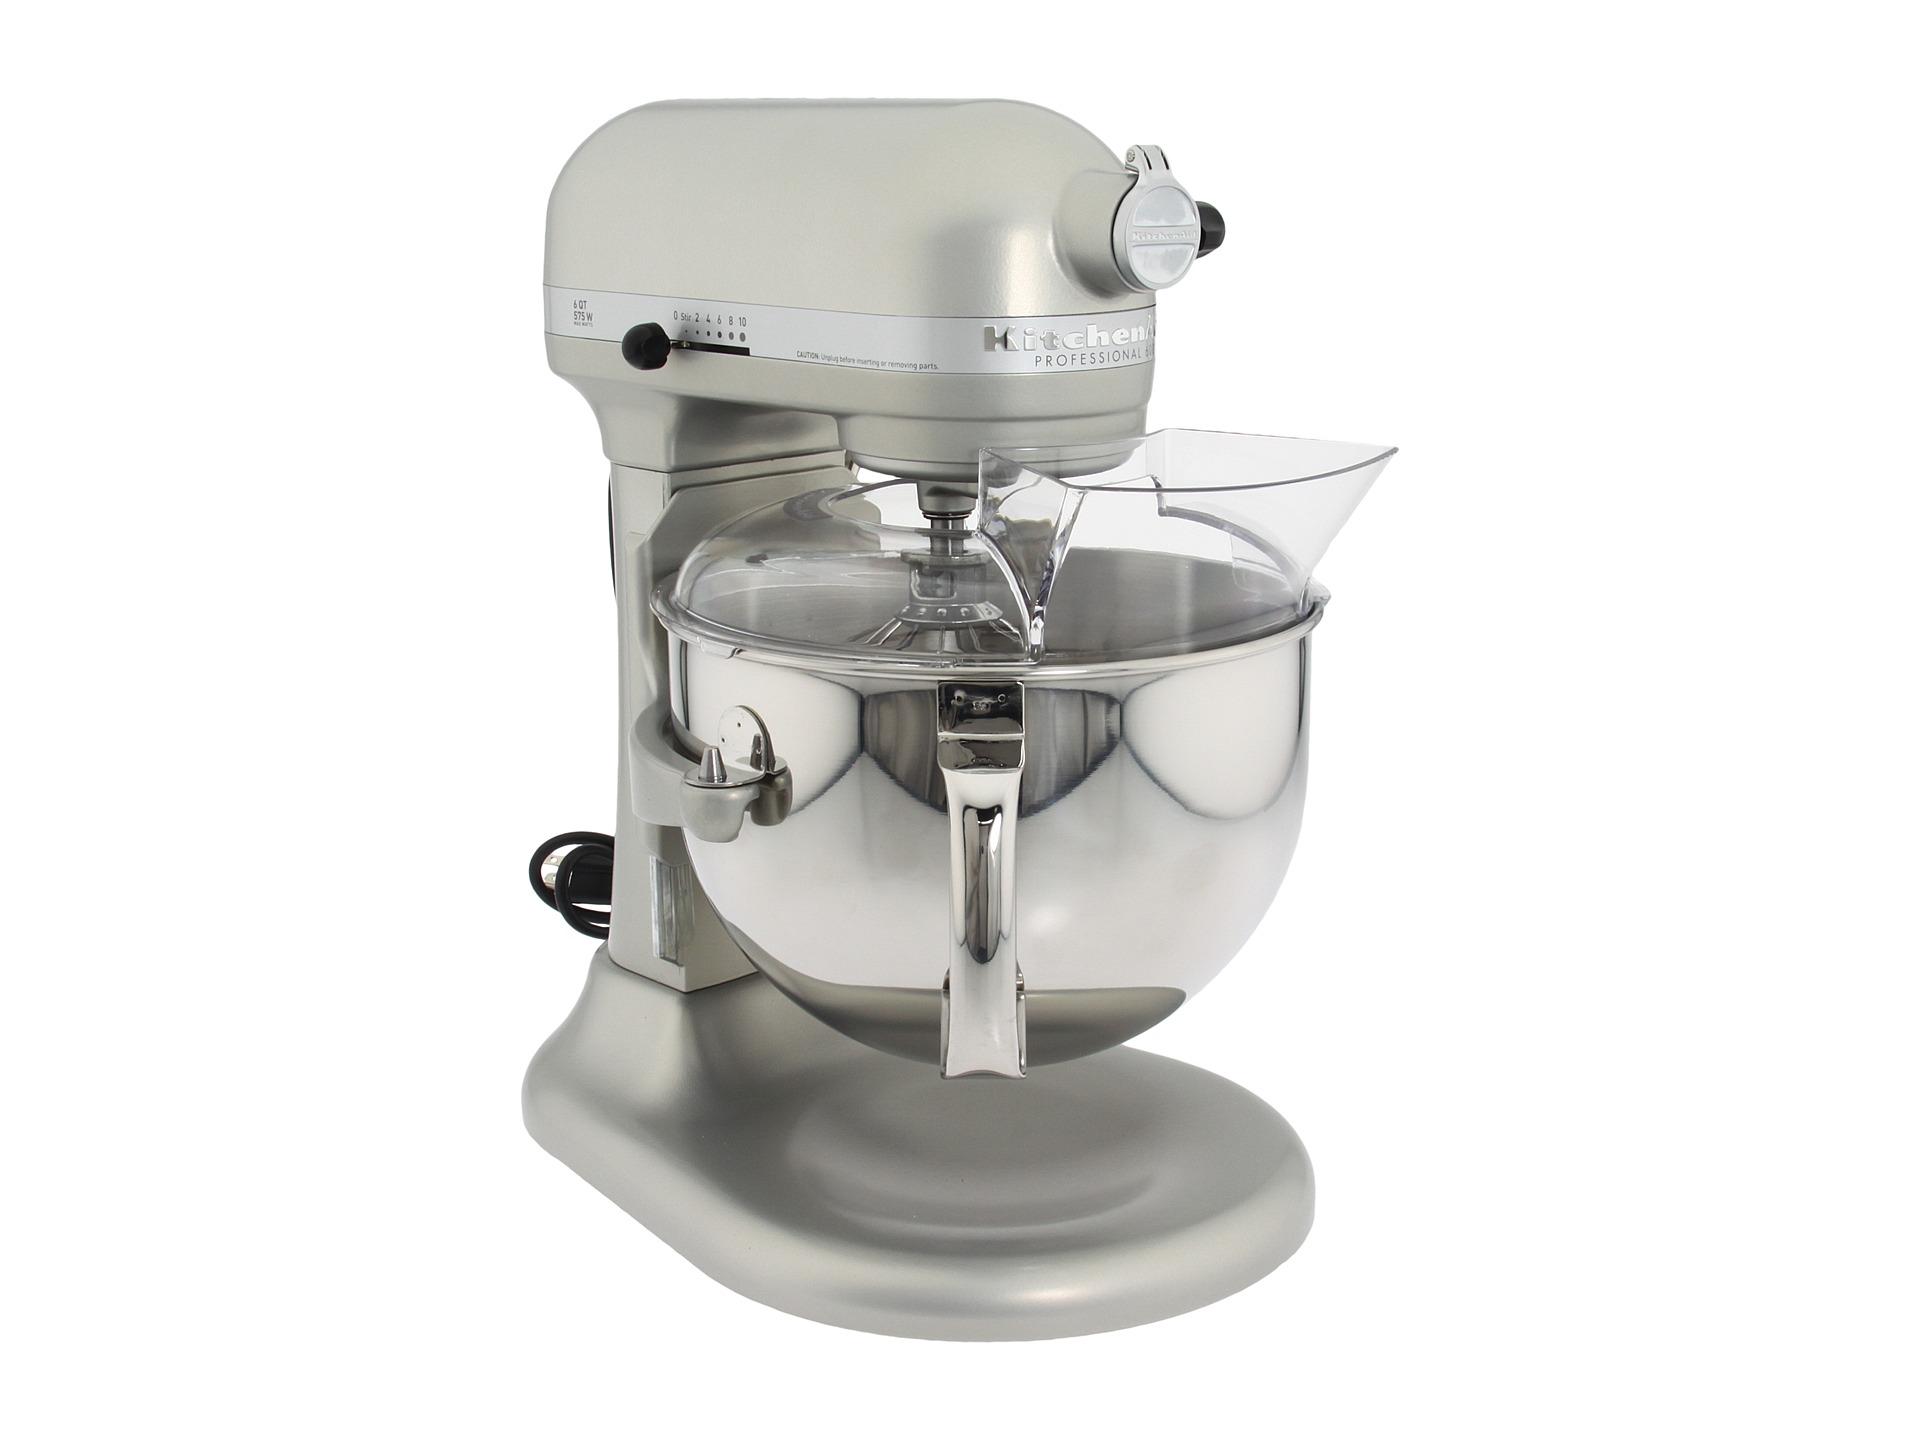 Kitchenaid Kp26m1x Professional 600 Series 6 Quart Bowl